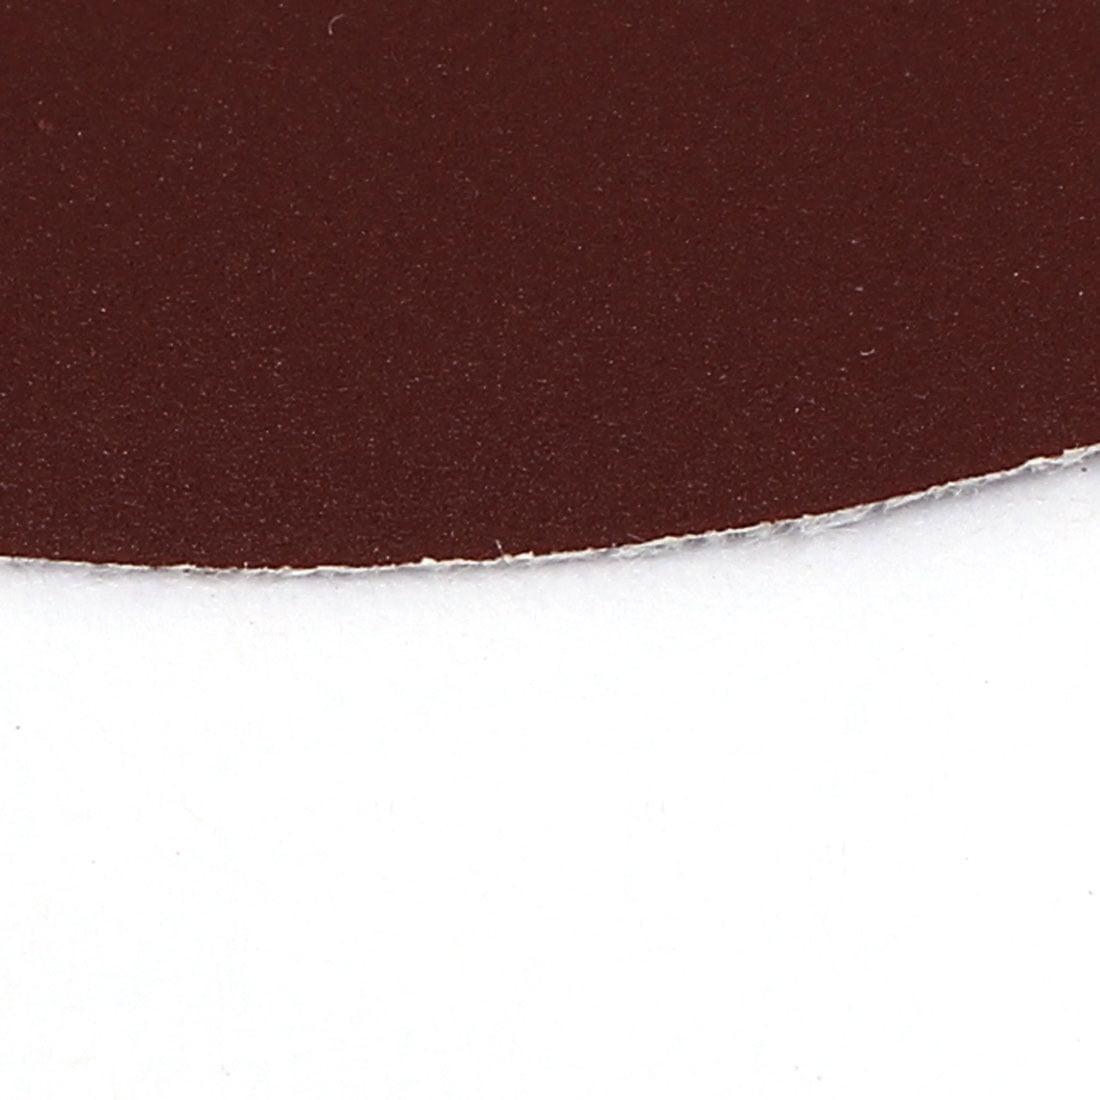 ARC ABRASIVES 30573 PSA Sanding Disc,AlO,Cloth,24in,60 Grit